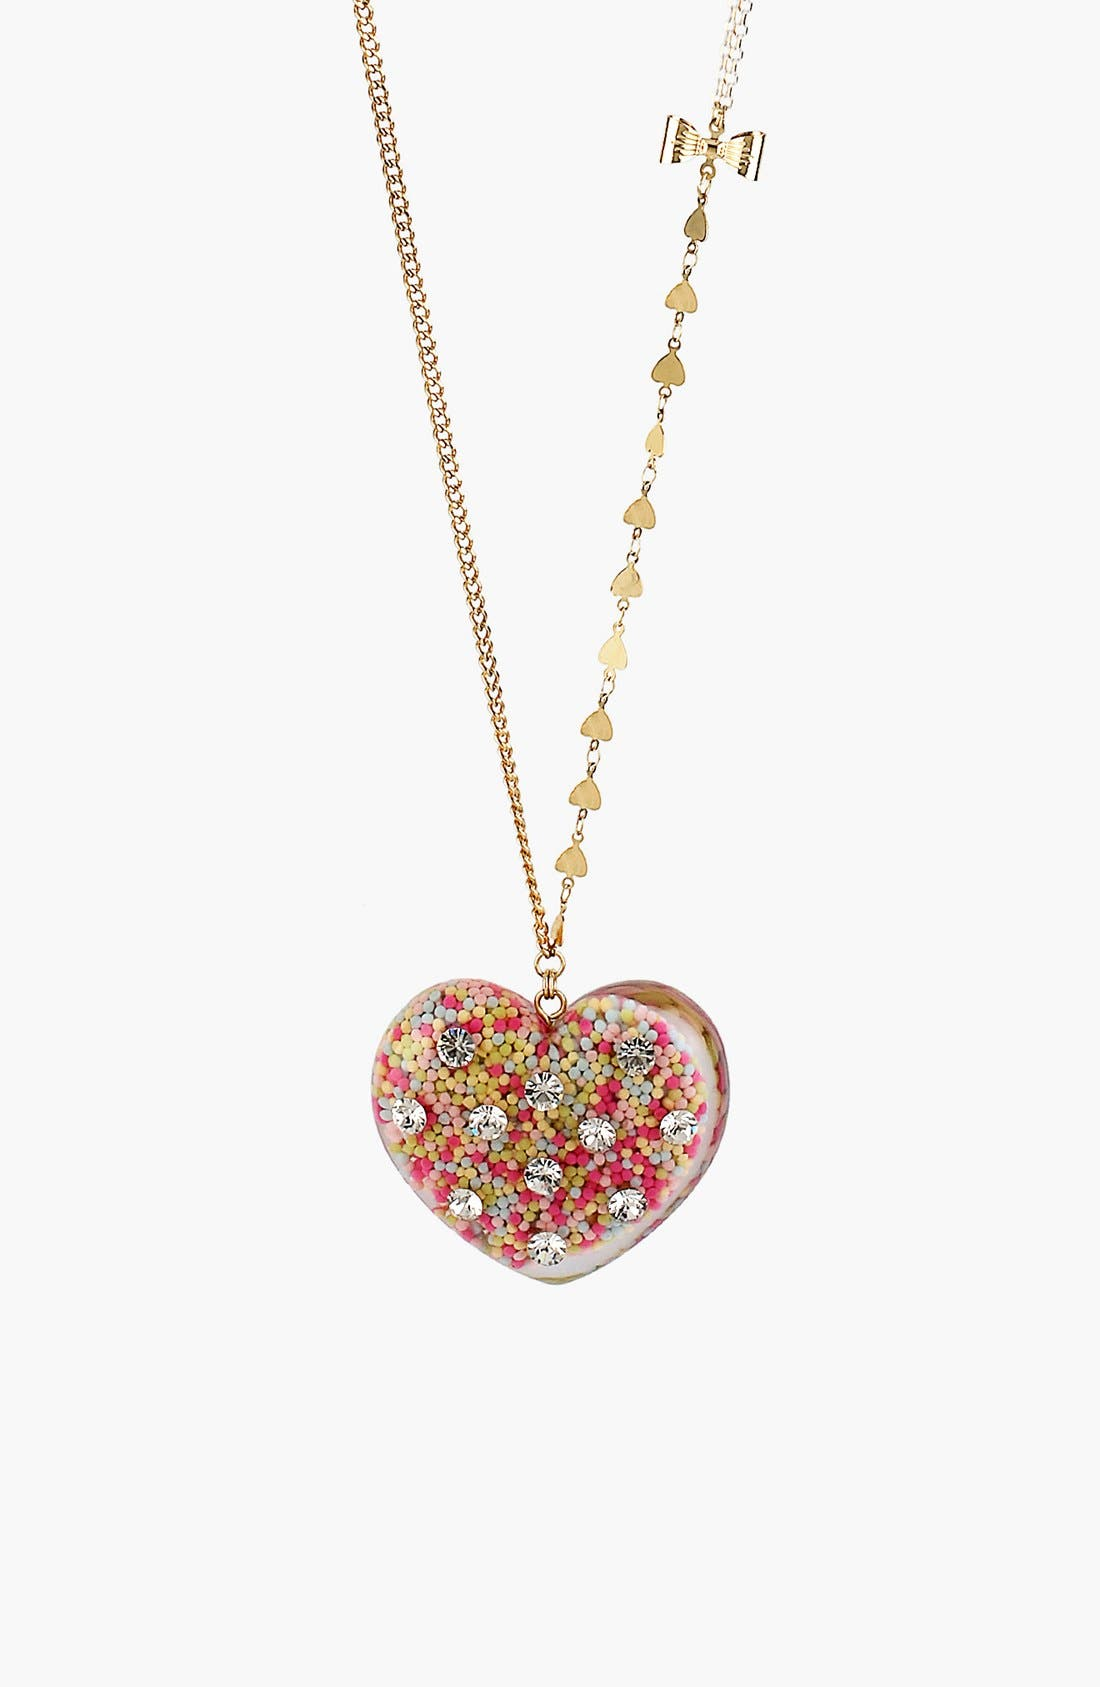 Main Image - Betsey Johnson 'Vintage Bow' Long Heart Pendant Necklace